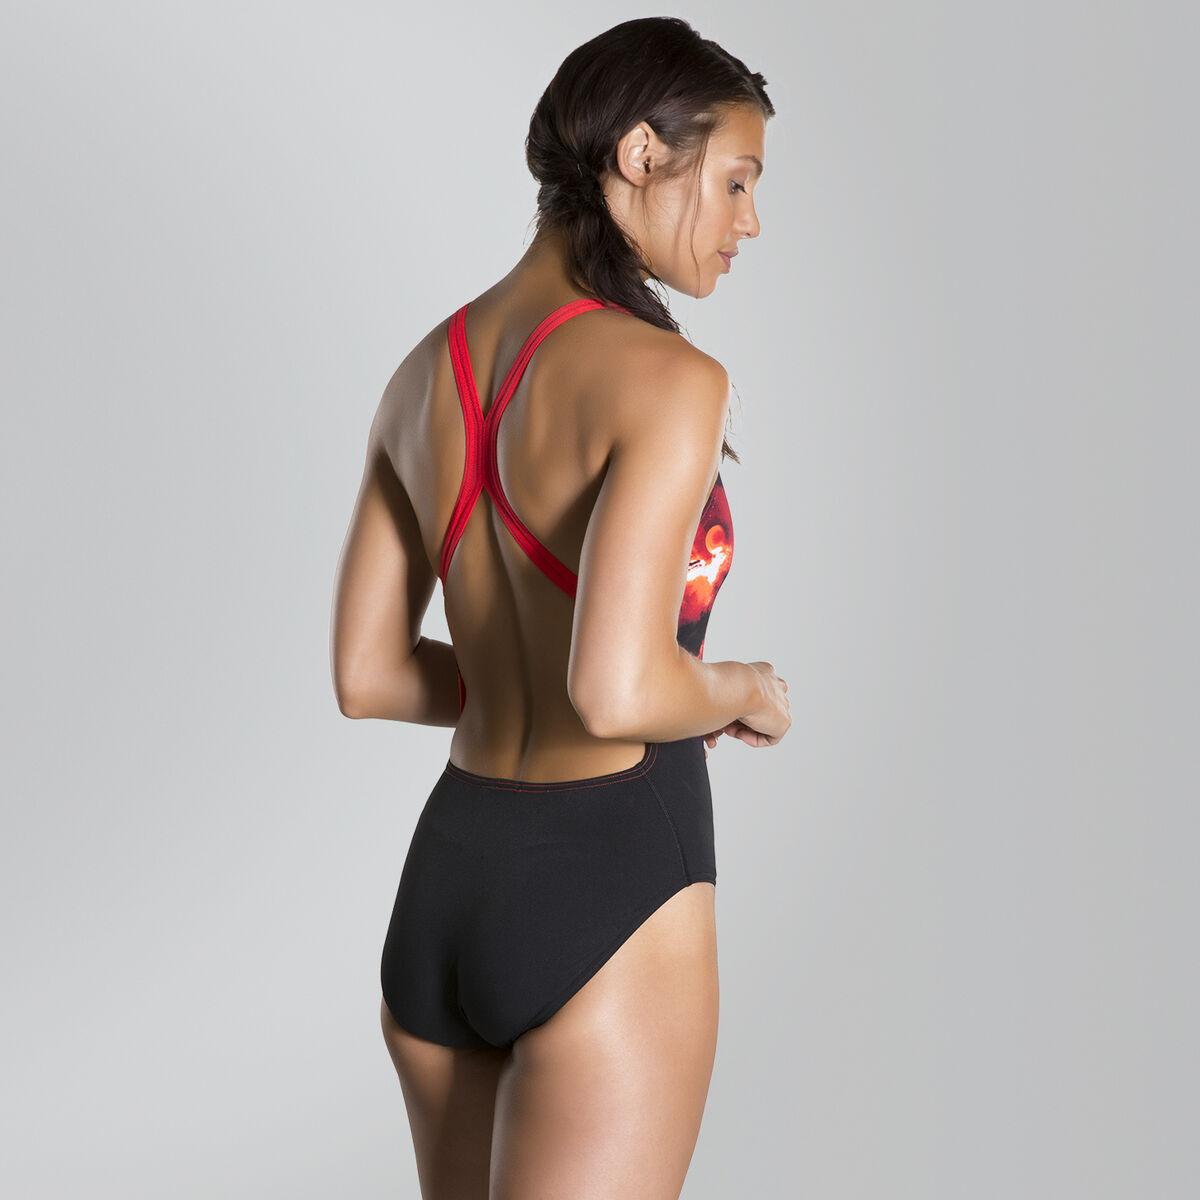 Spacedust Placement Digital Powerback Swimsuit